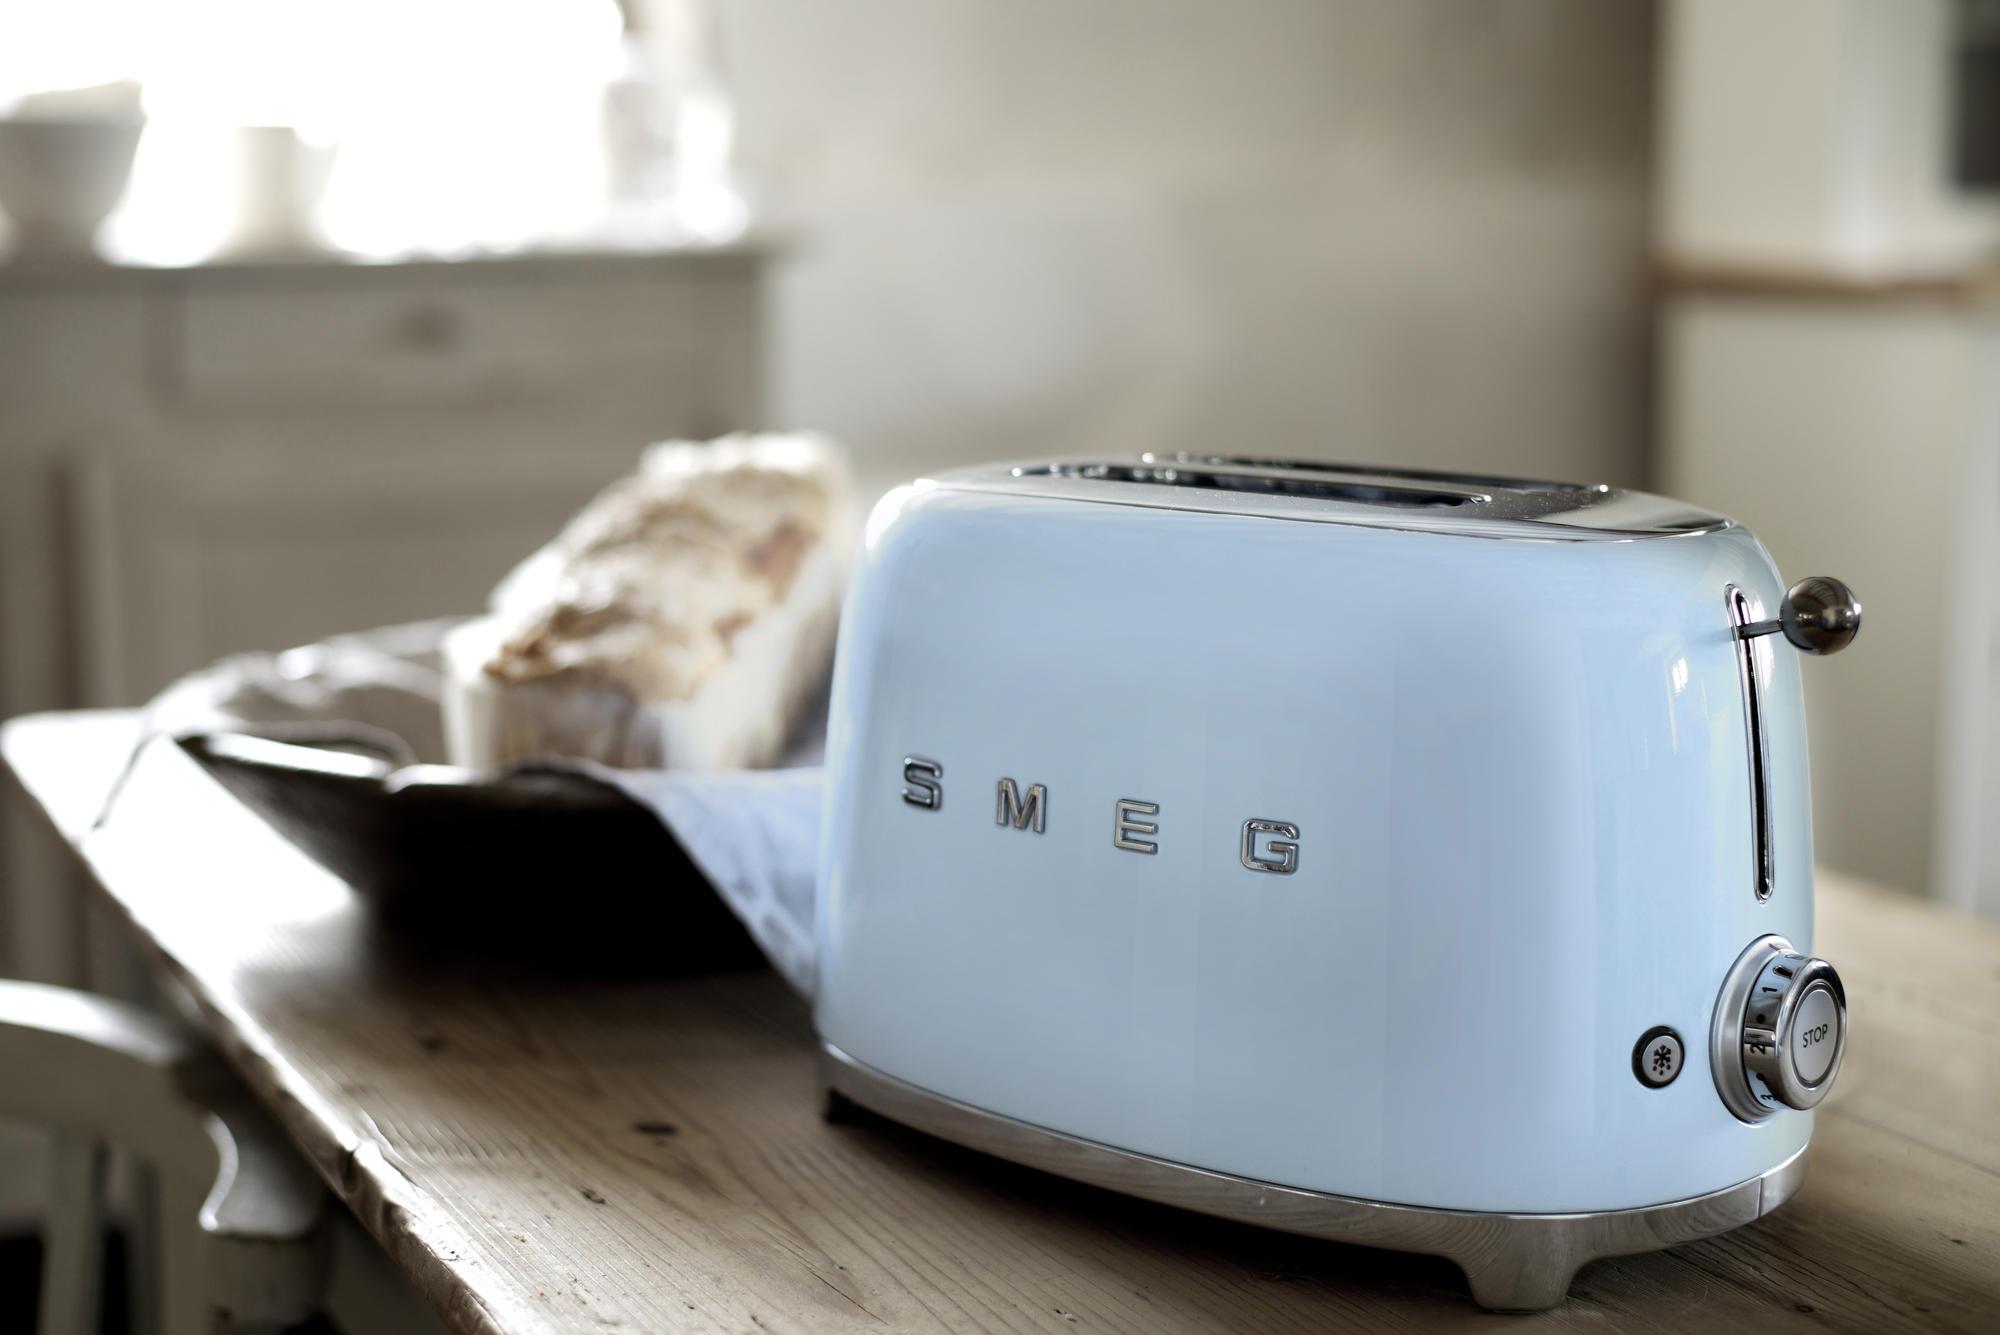 WEB_TSF01PBAU_56.jpg-smeg-toaster-retro-design-50s-60s-shop-bleywaren